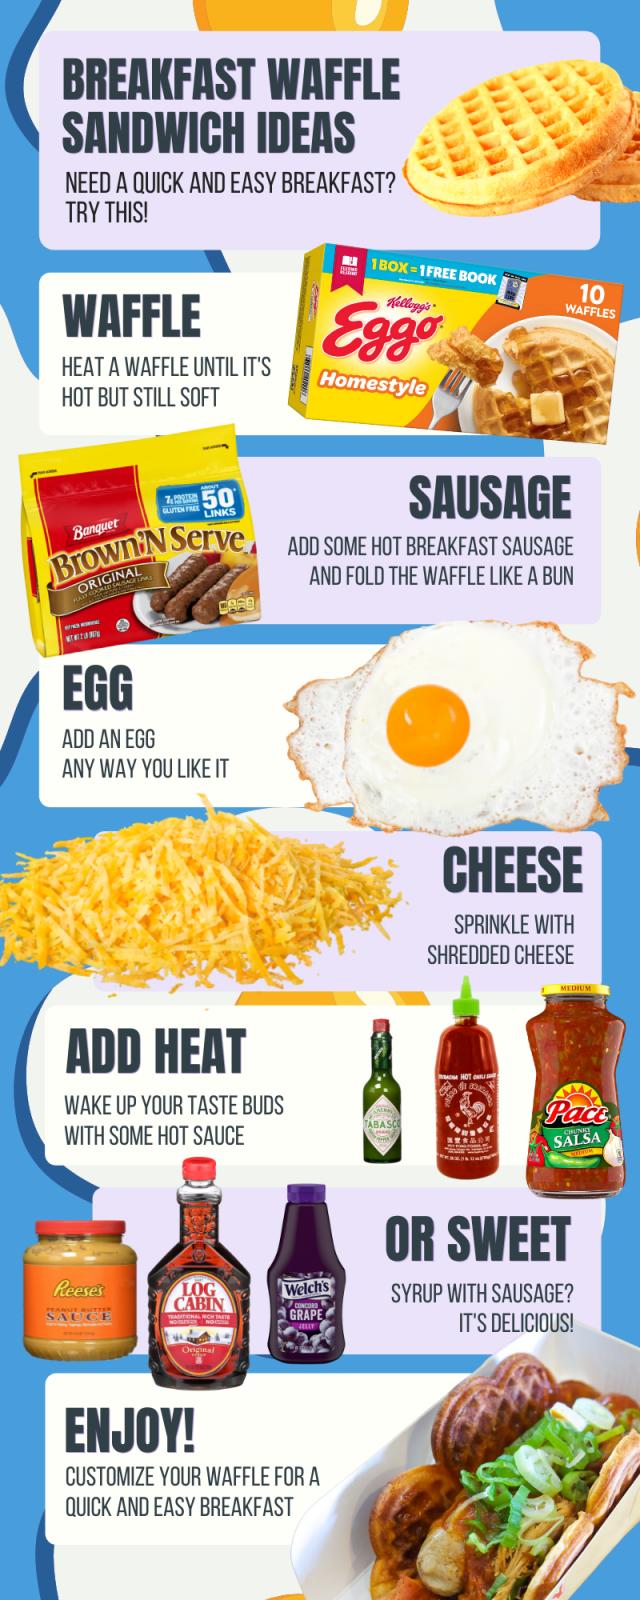 breakfast menu with waffle tacos